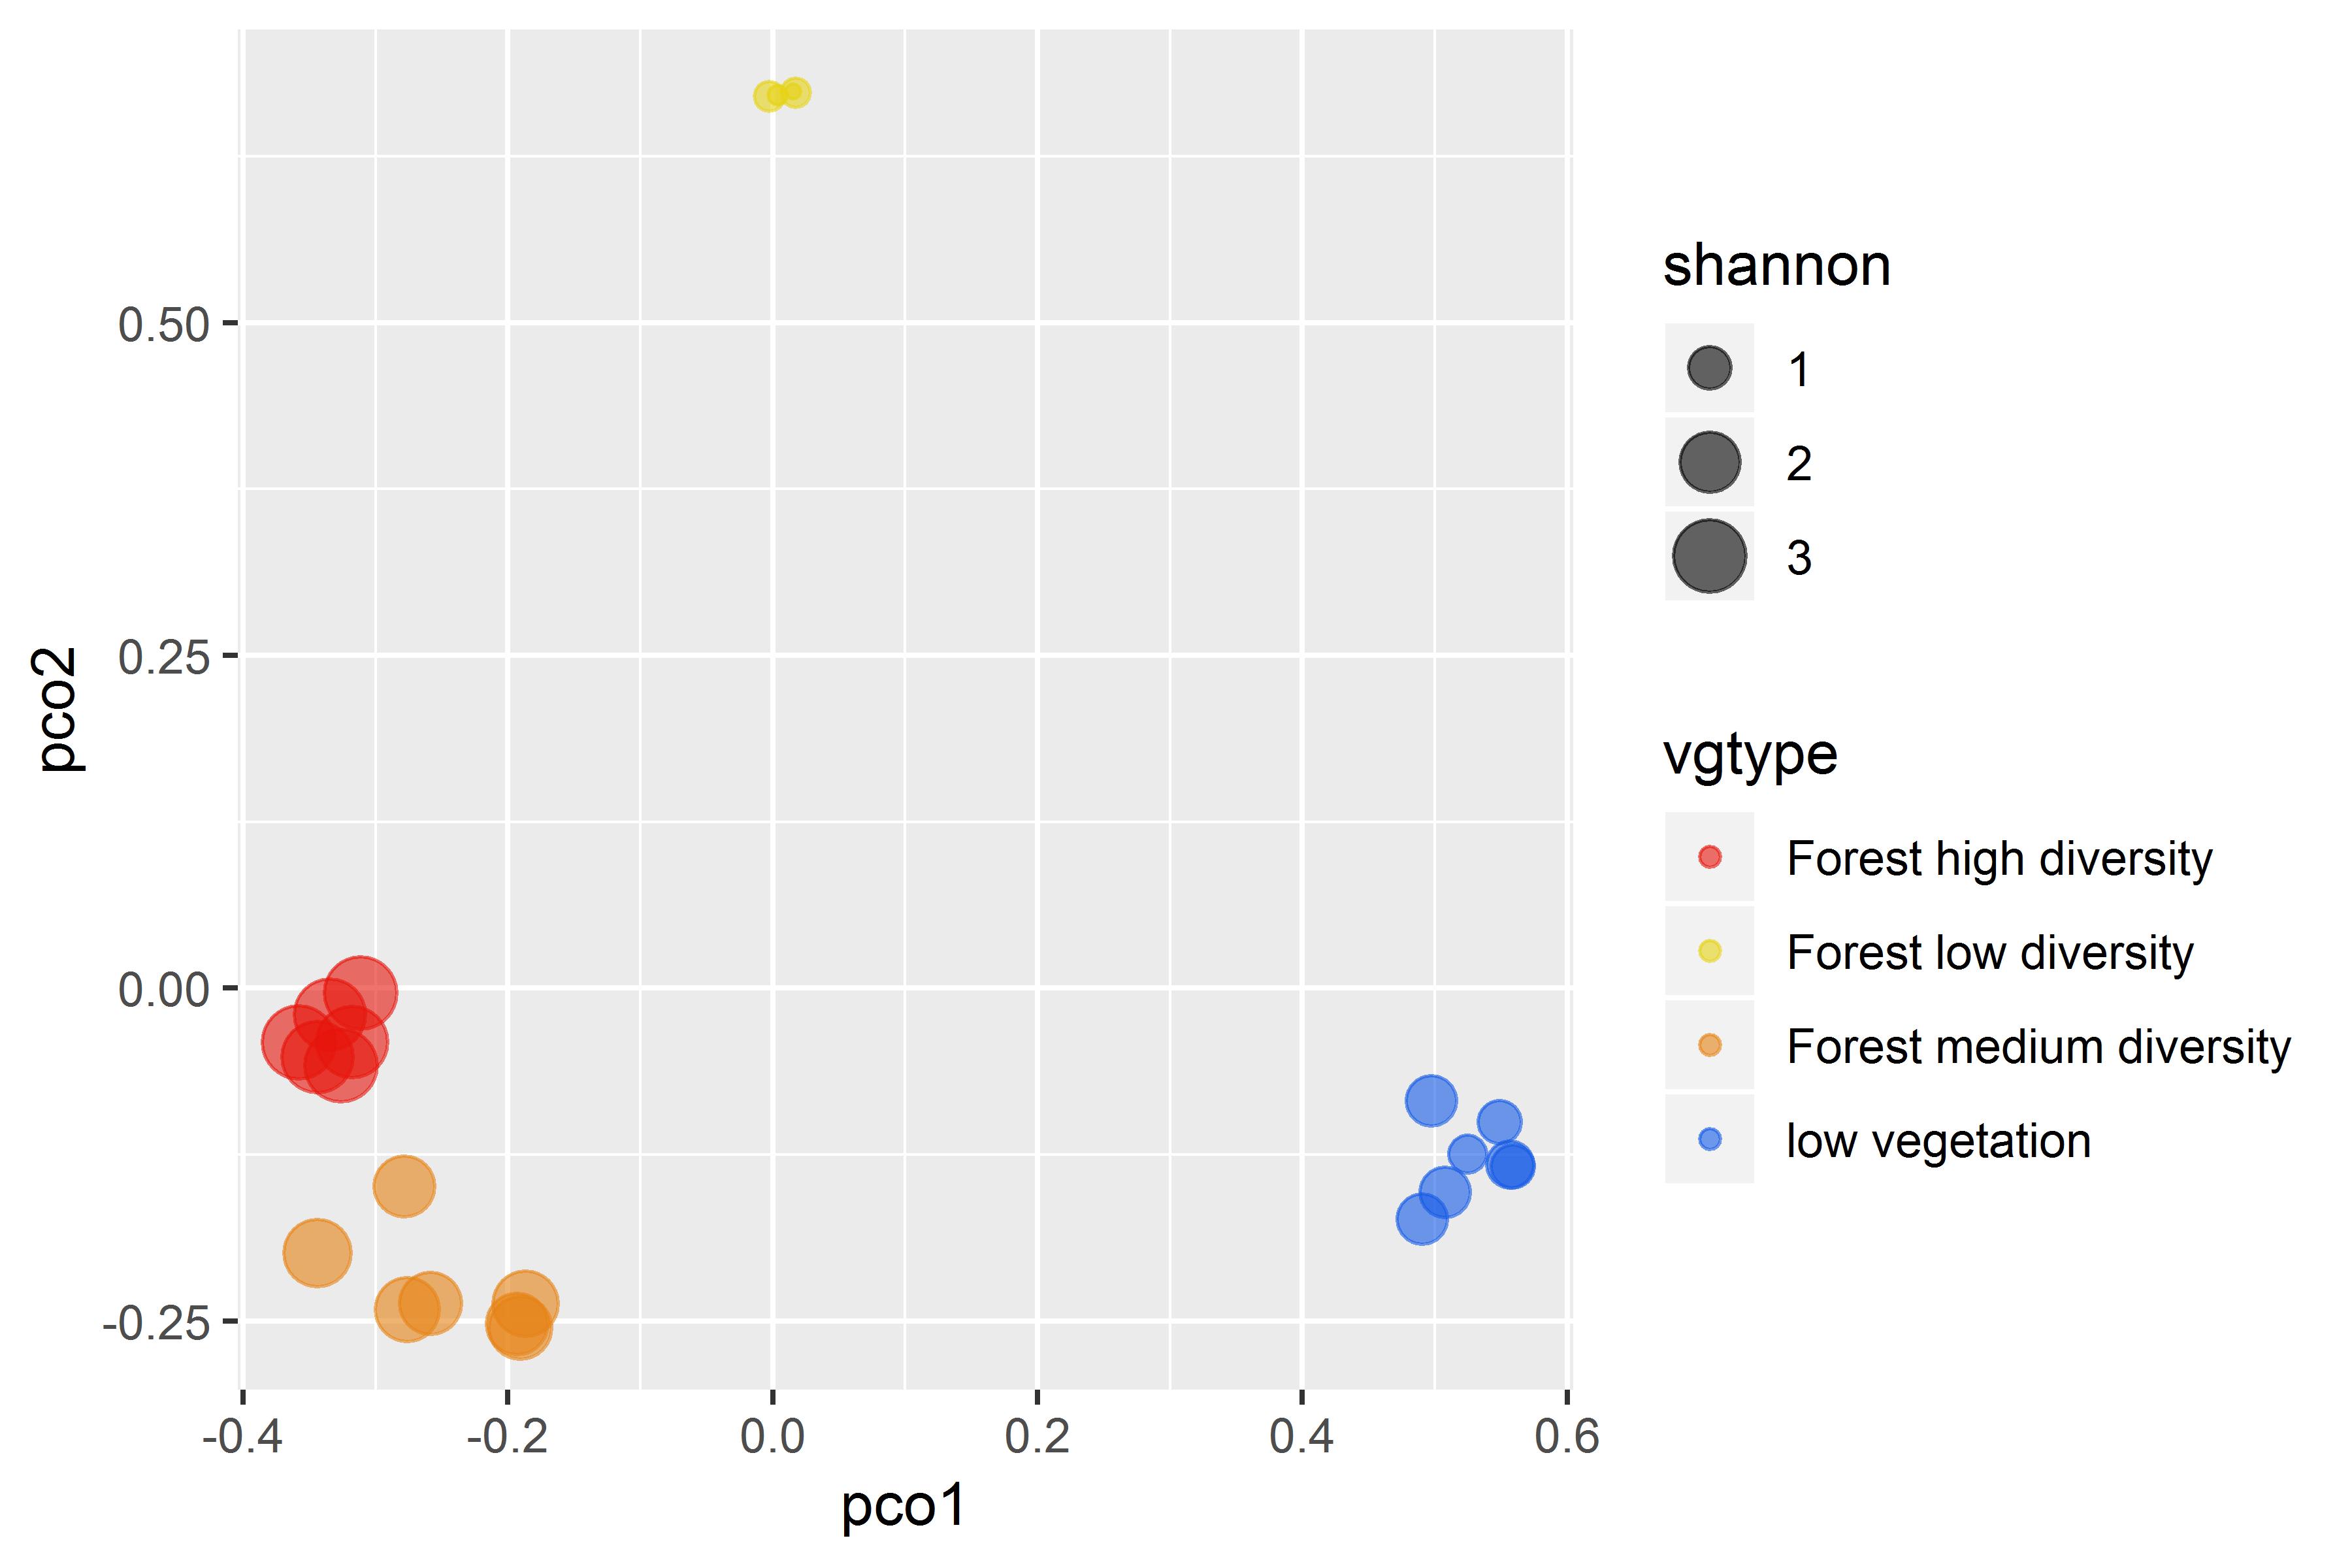 man/figures/BetaDiversity_PcoA1_vs_PcoA2.png